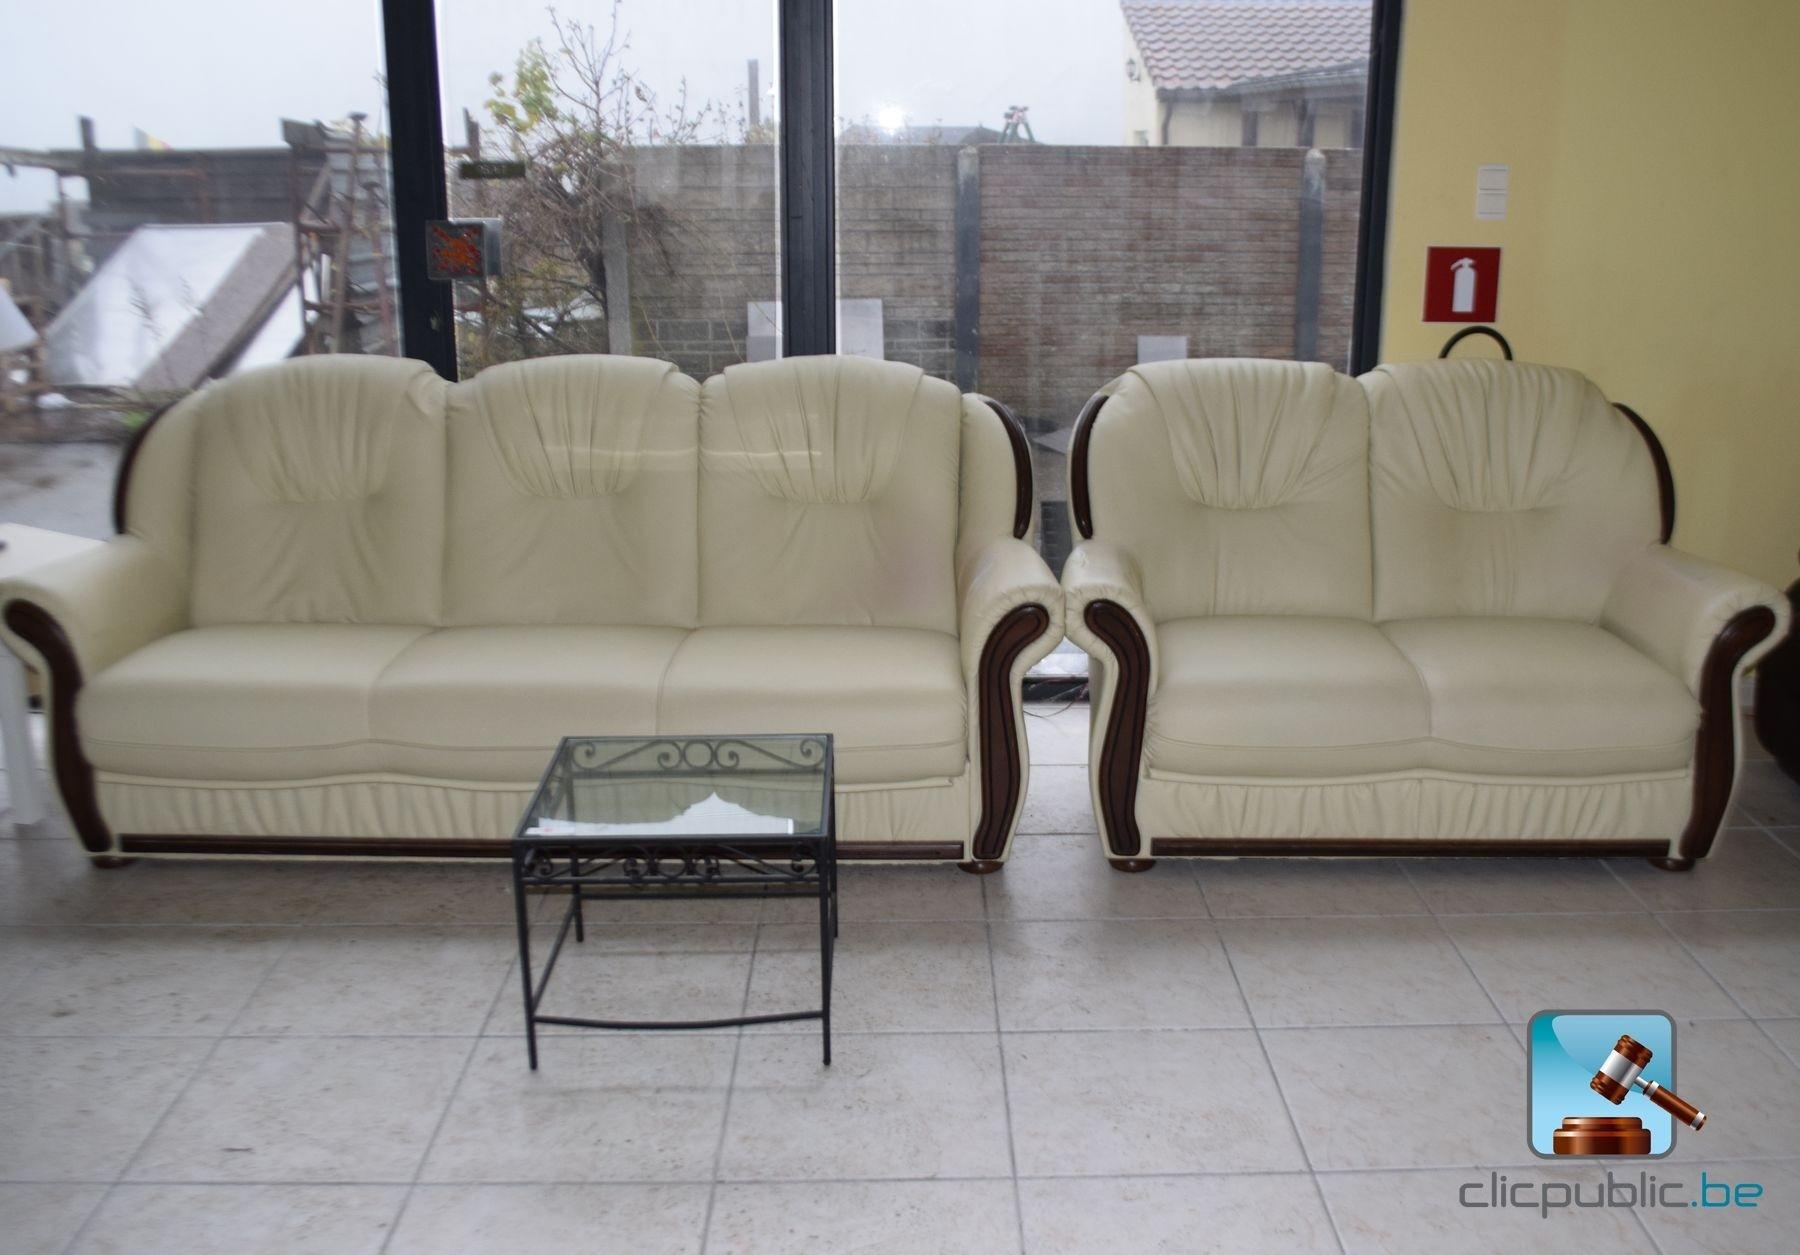 Living room furniture ref 10 for sale on for 9 x 10 living room